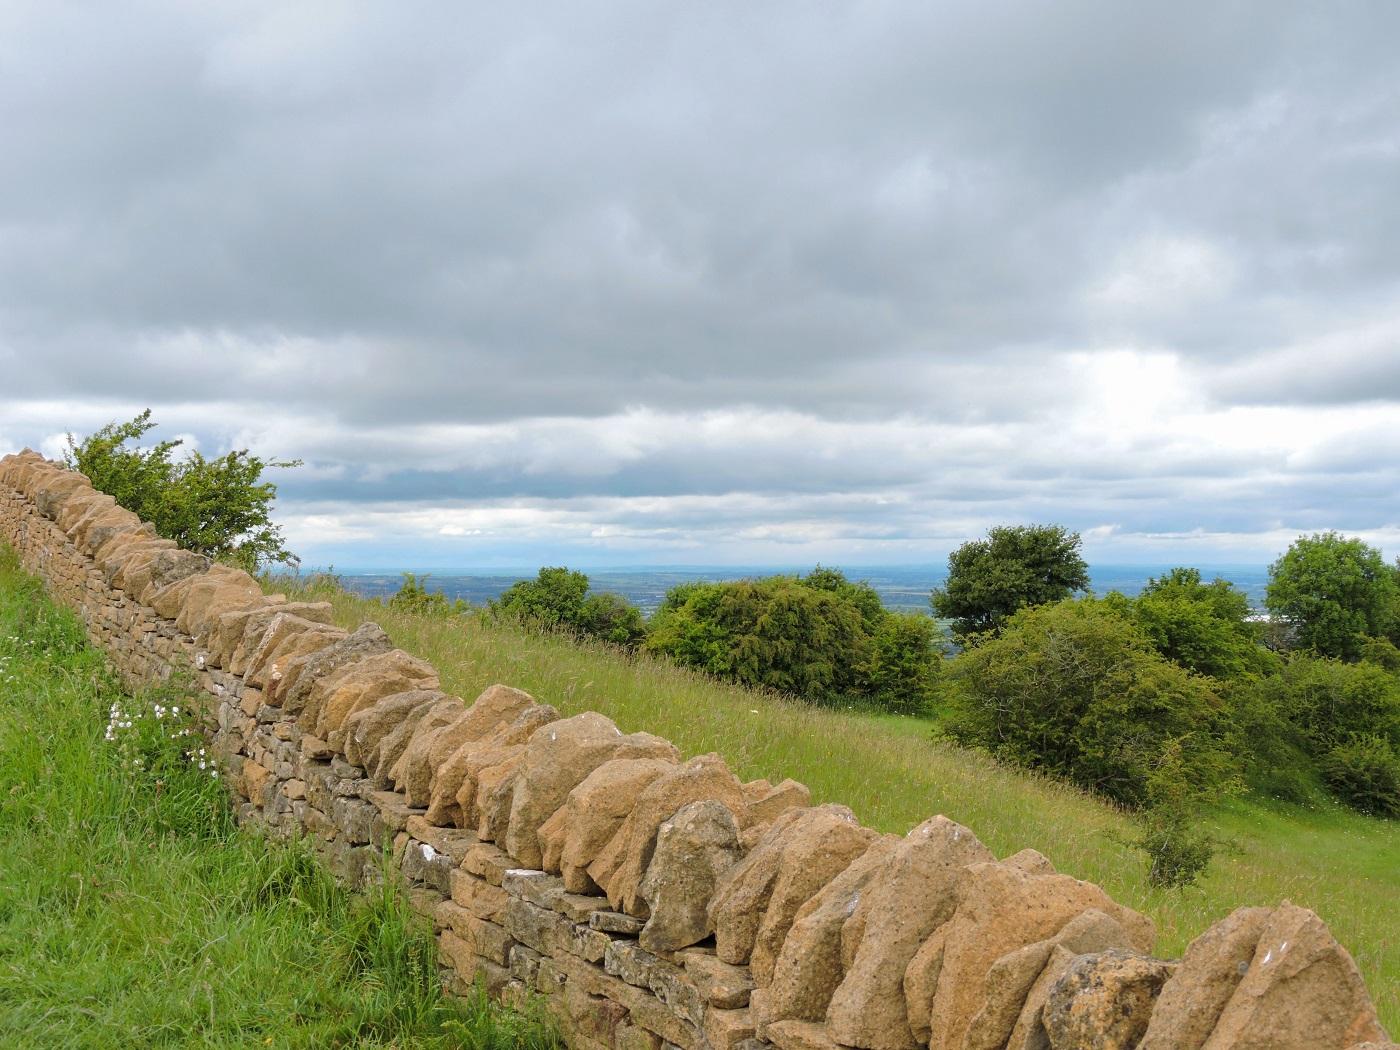 stone wall along the way